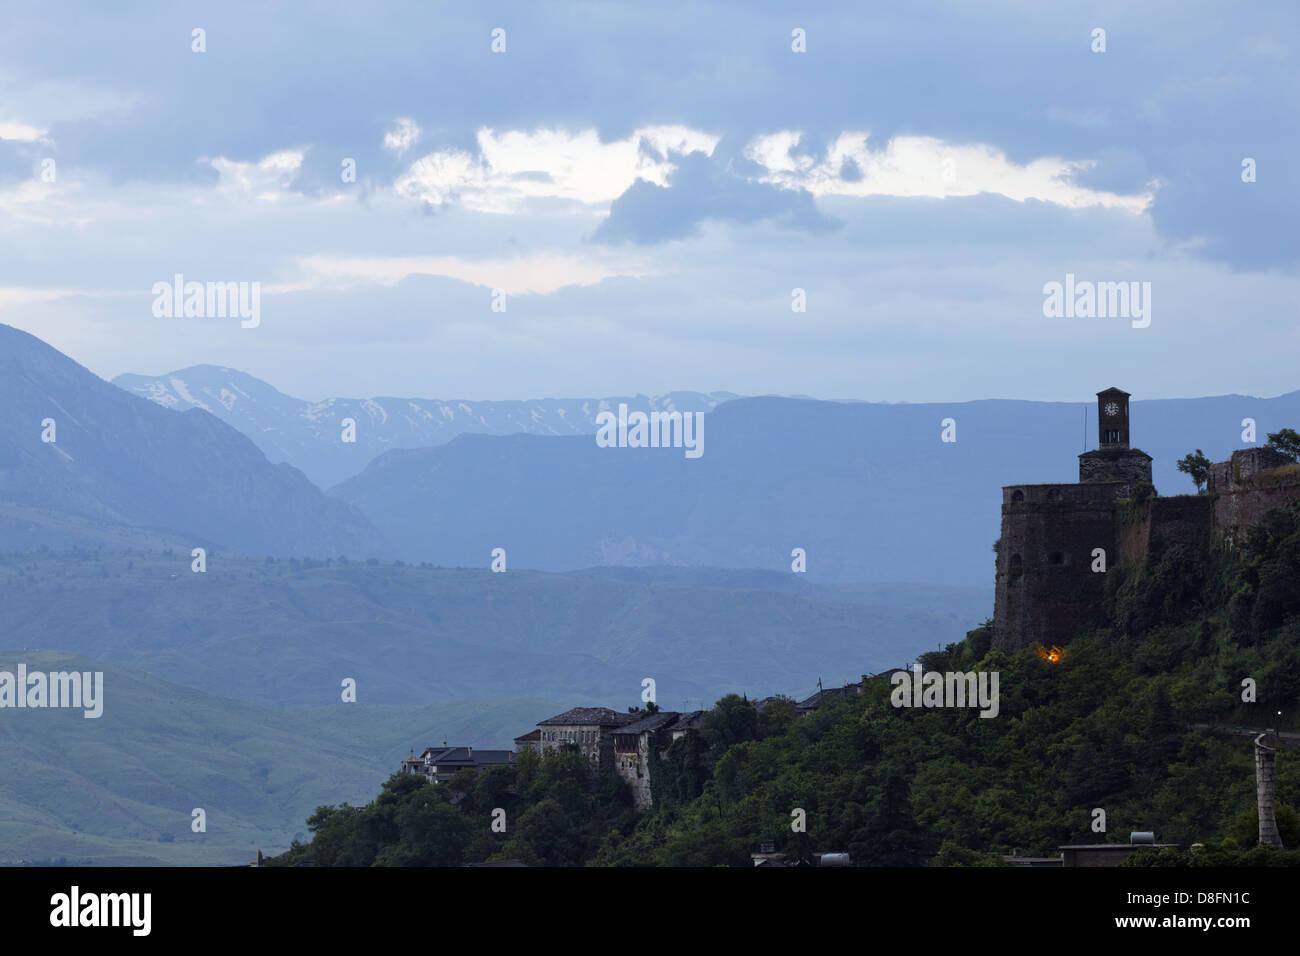 Albania, Gjirokastra, UNESCO; Castle, Albanien, Gjirokastra, UNESCO Welterbe; Burg - Stock Image